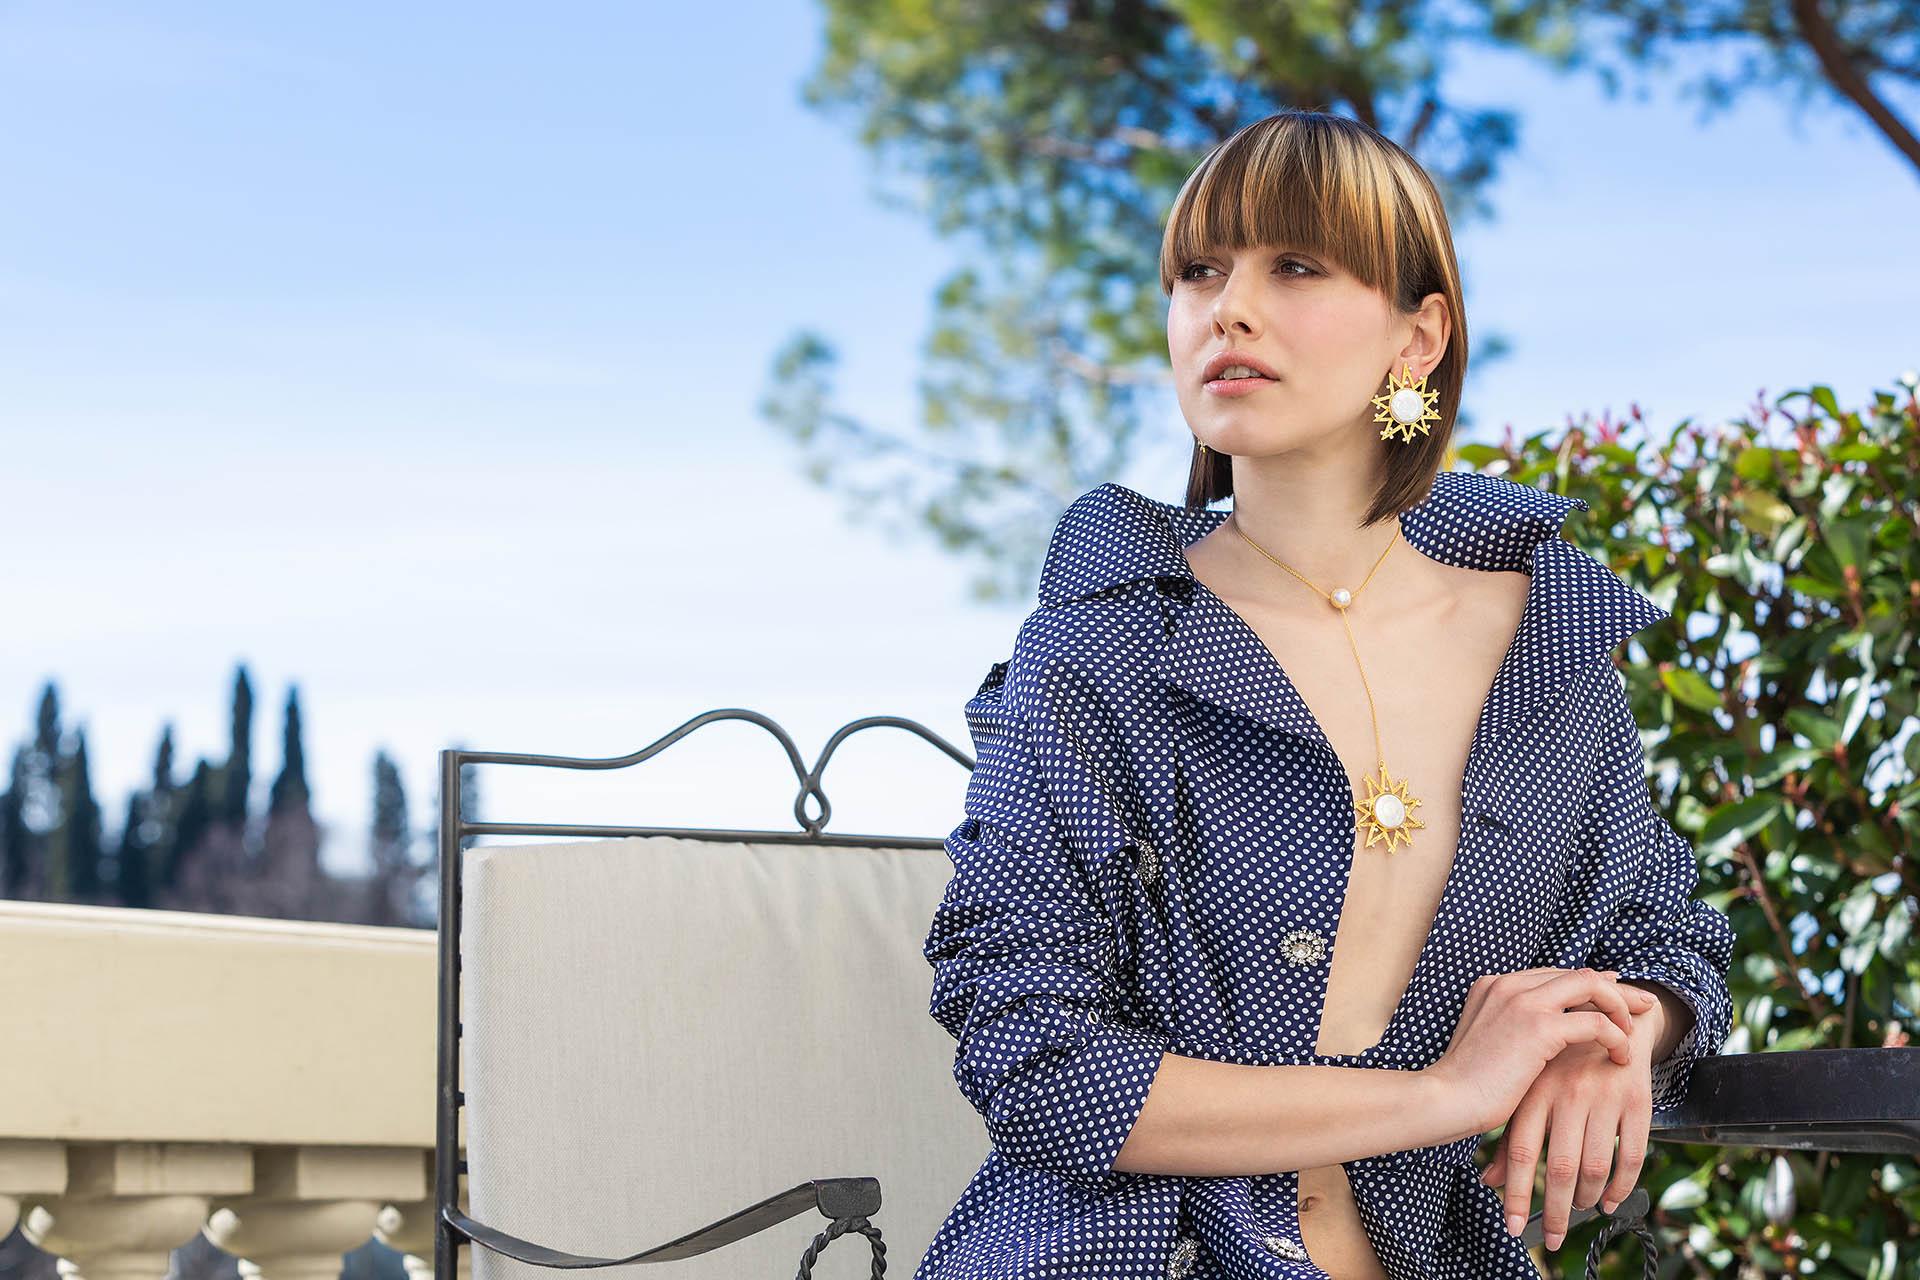 Dorin Vasilescu - Advertising Photography